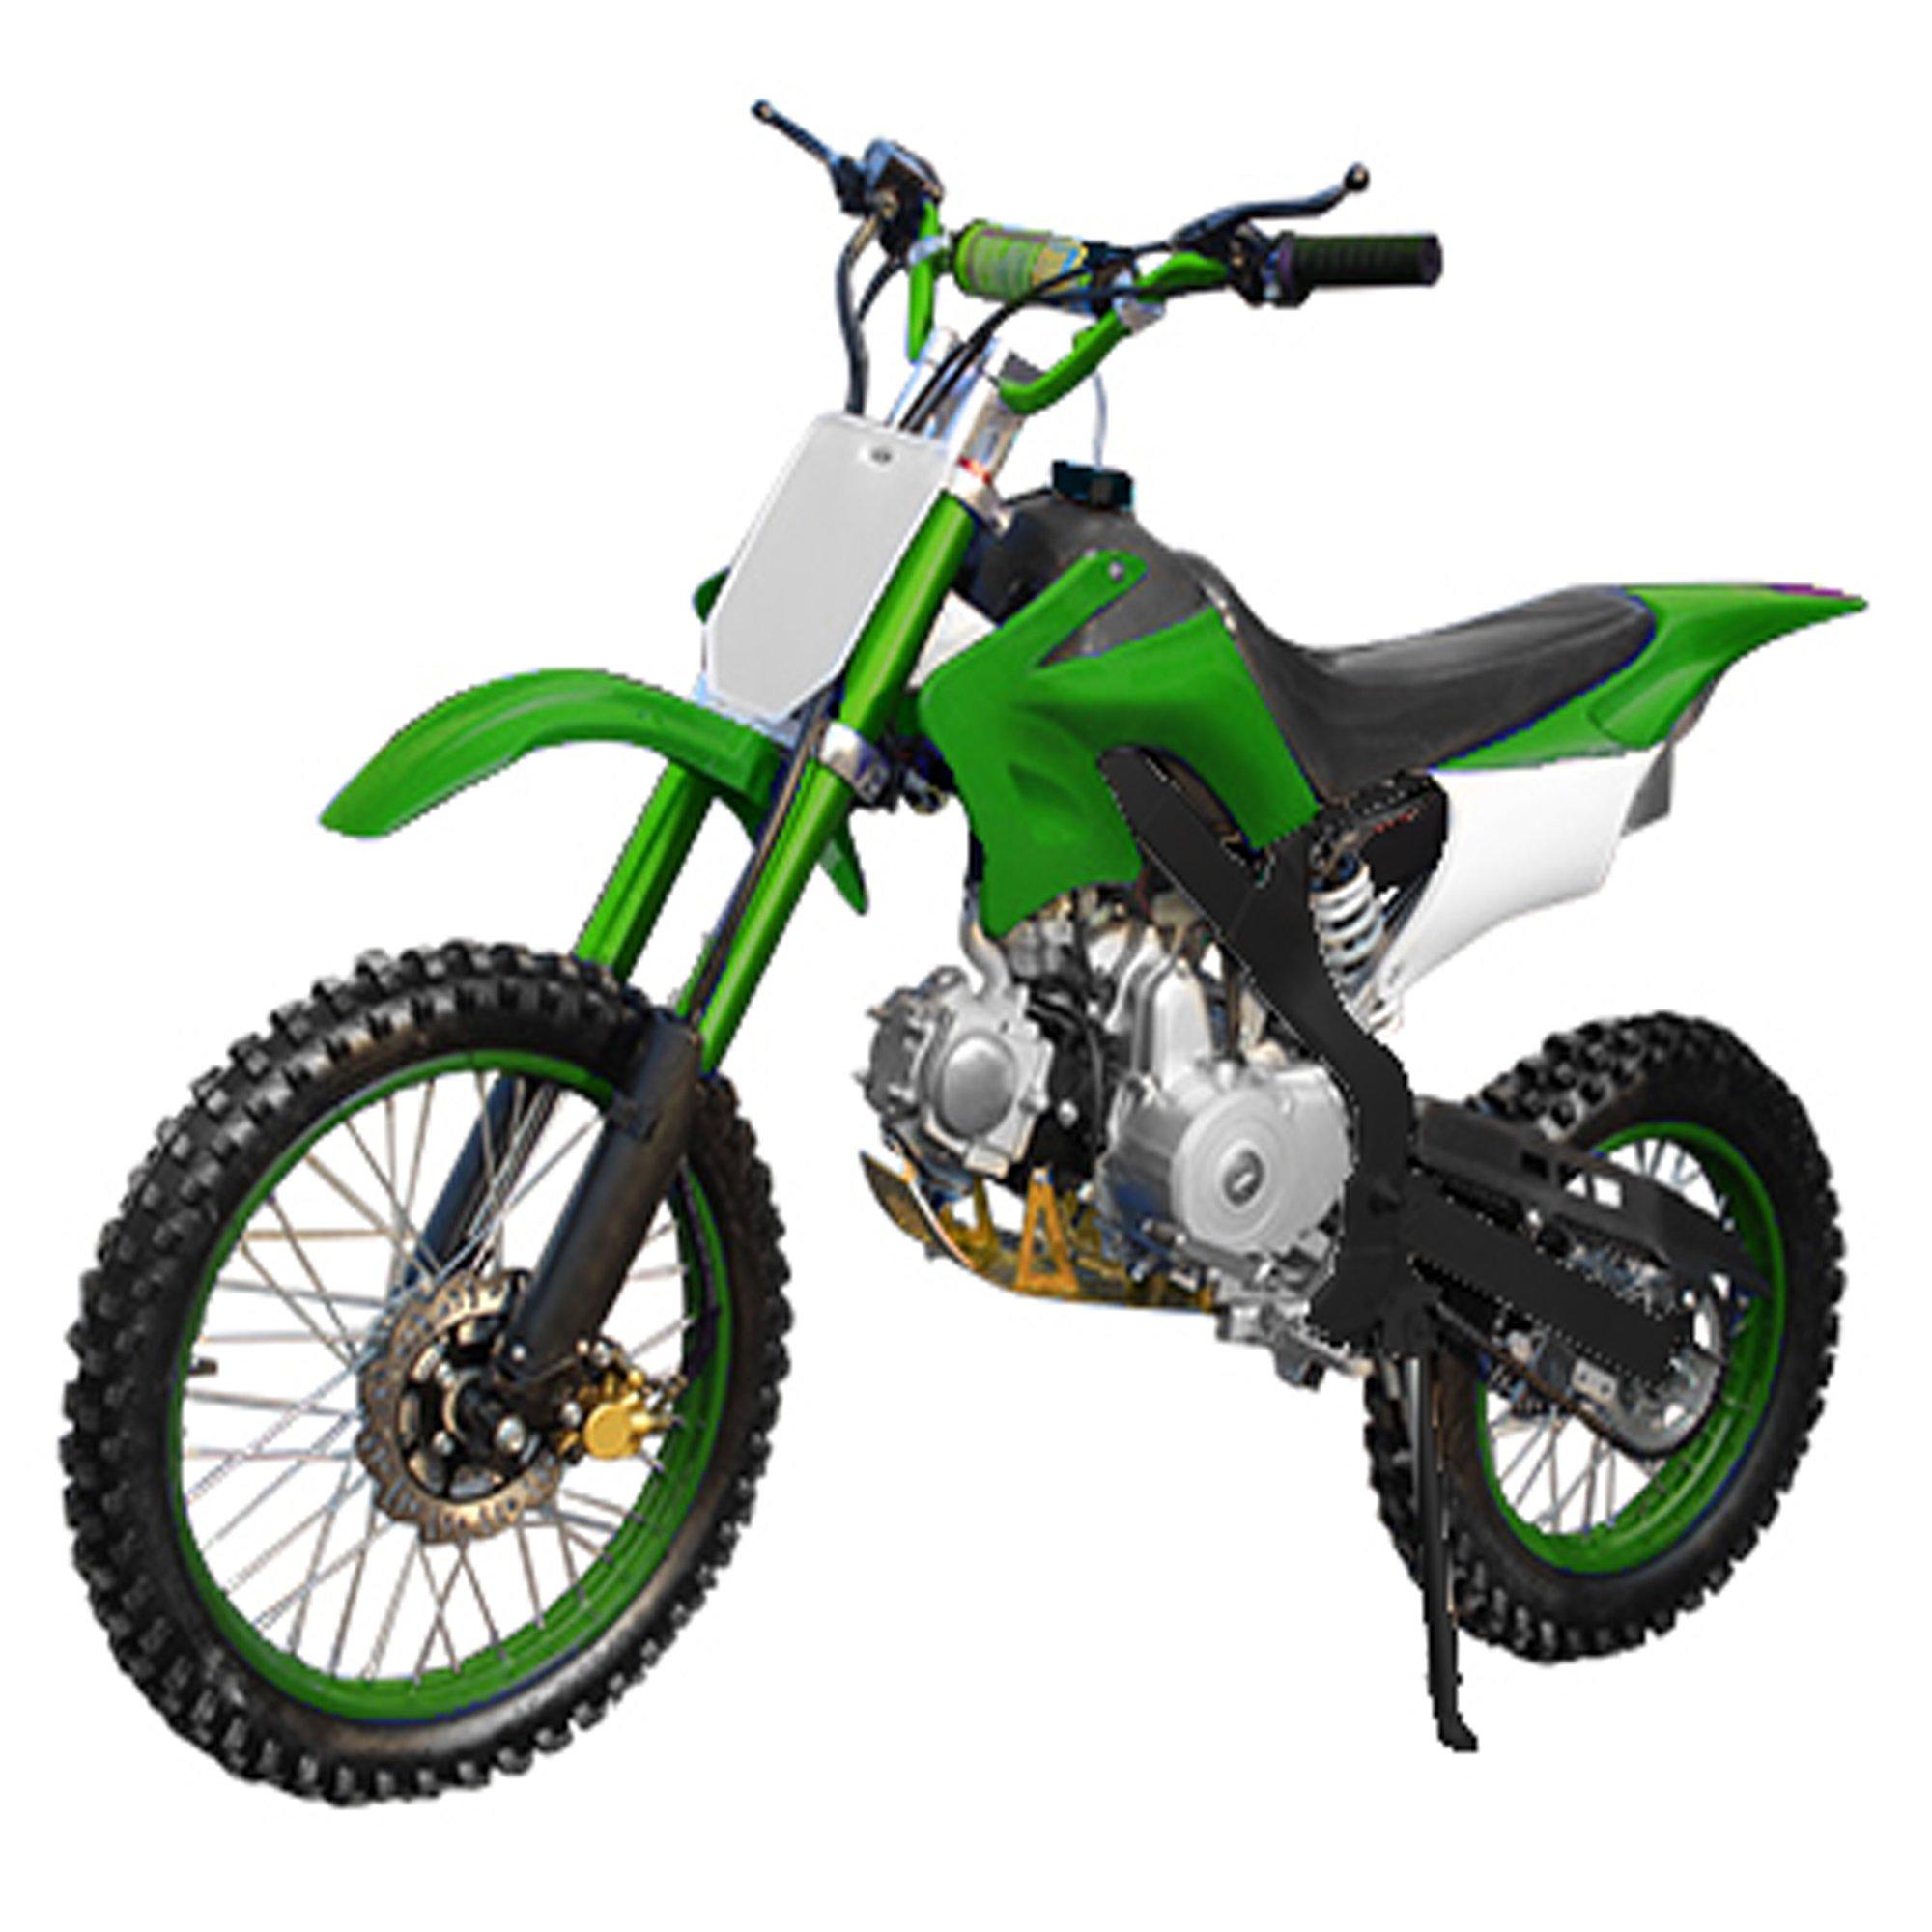 Freno Trasero Cilindro Calibrador Conjunto Tierra a Cielo para Dirt Pit Bike ATV 110CC